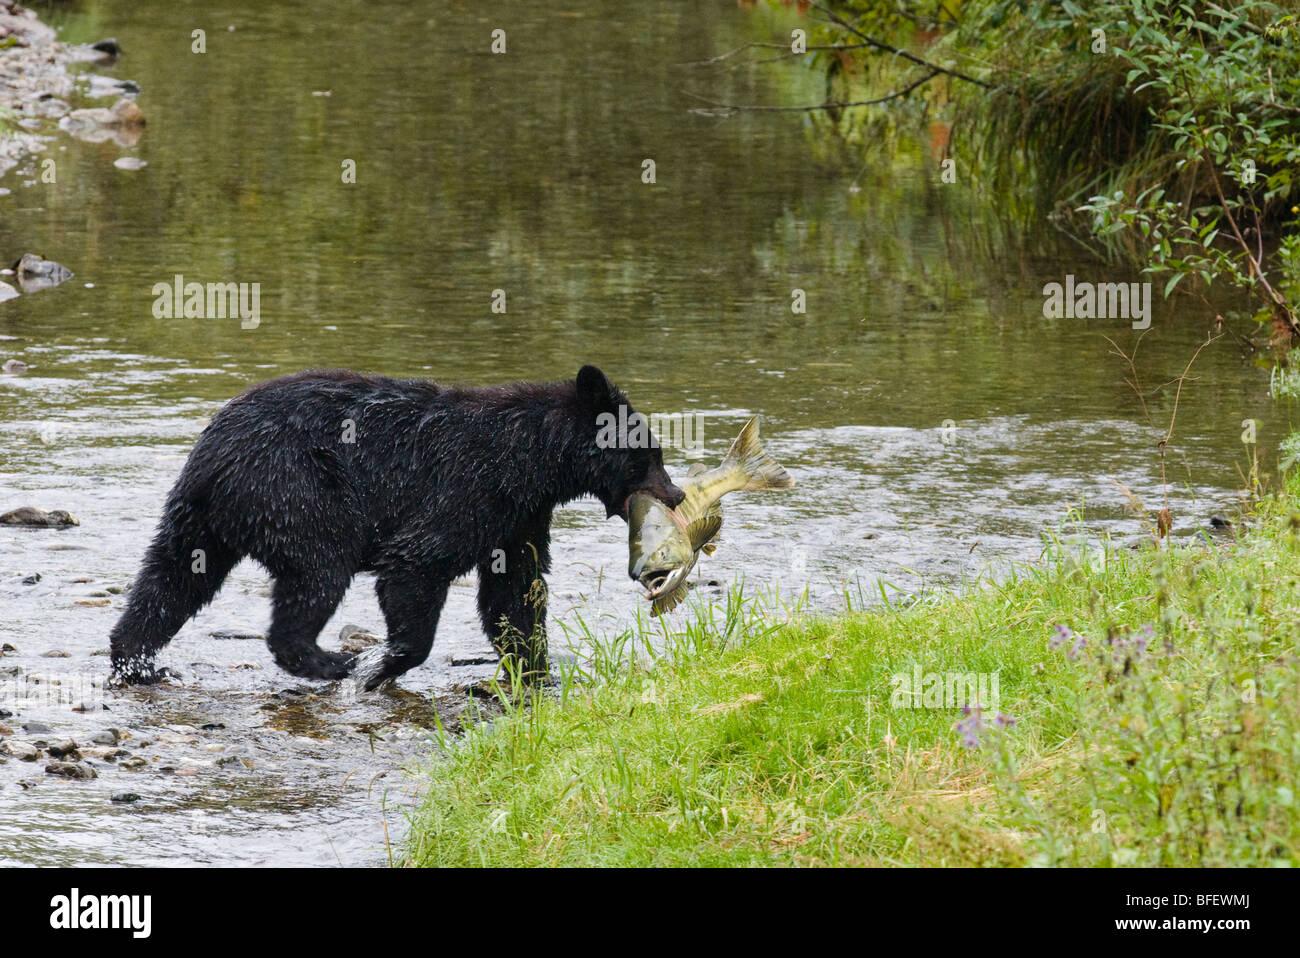 Adult Black bear (Ursus americanus) with Chum salmon it has just caught, Fish Creek, Tongass National Forest, Alaska, - Stock Image